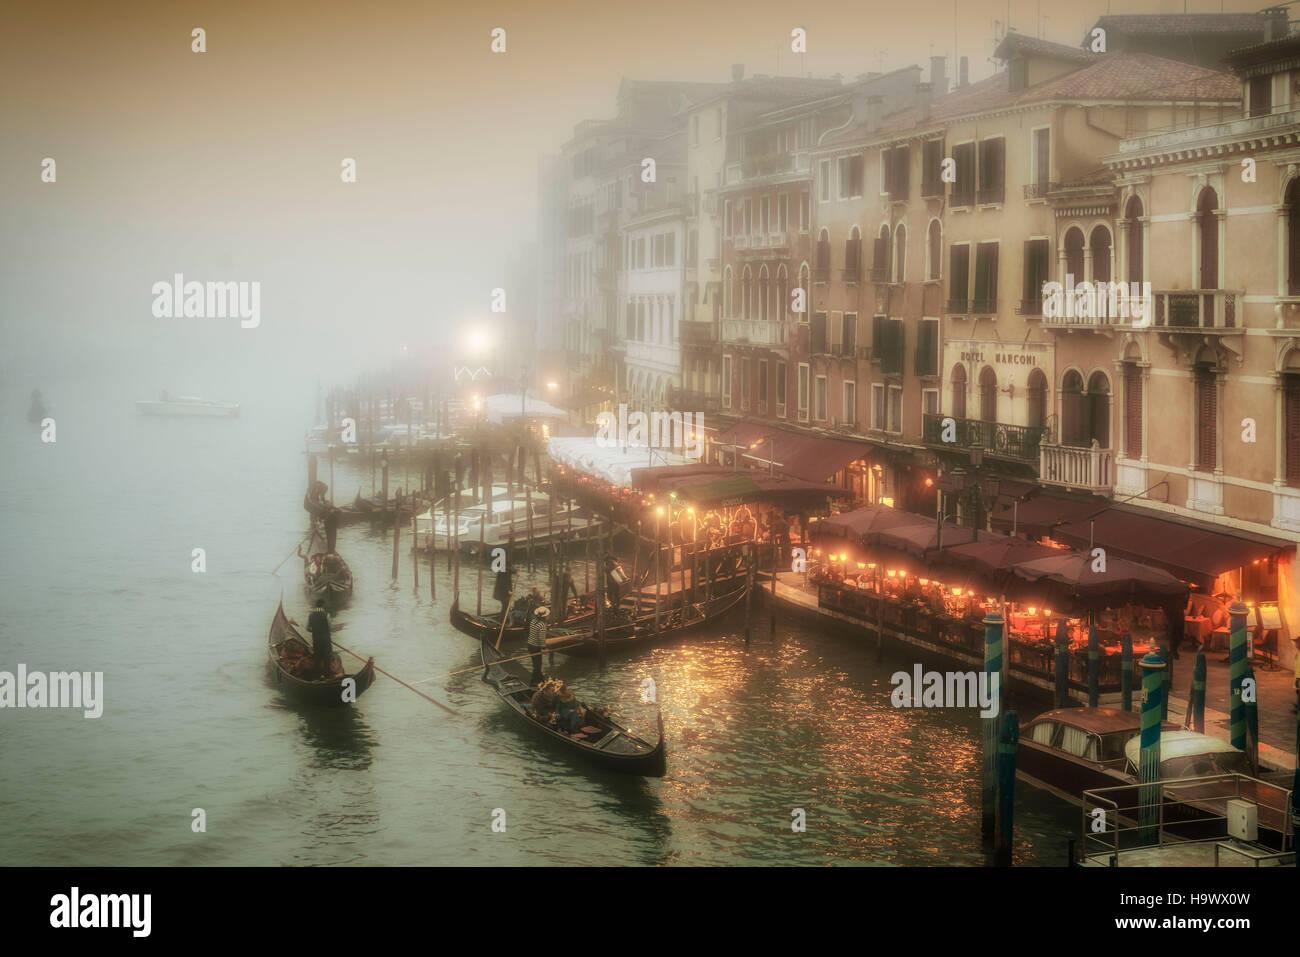 View from Rialto bridge to Canal Garnle at dusk, fog, gondolas ,  Venedig, Venezia, Venice, Italia, Europe, - Stock Image